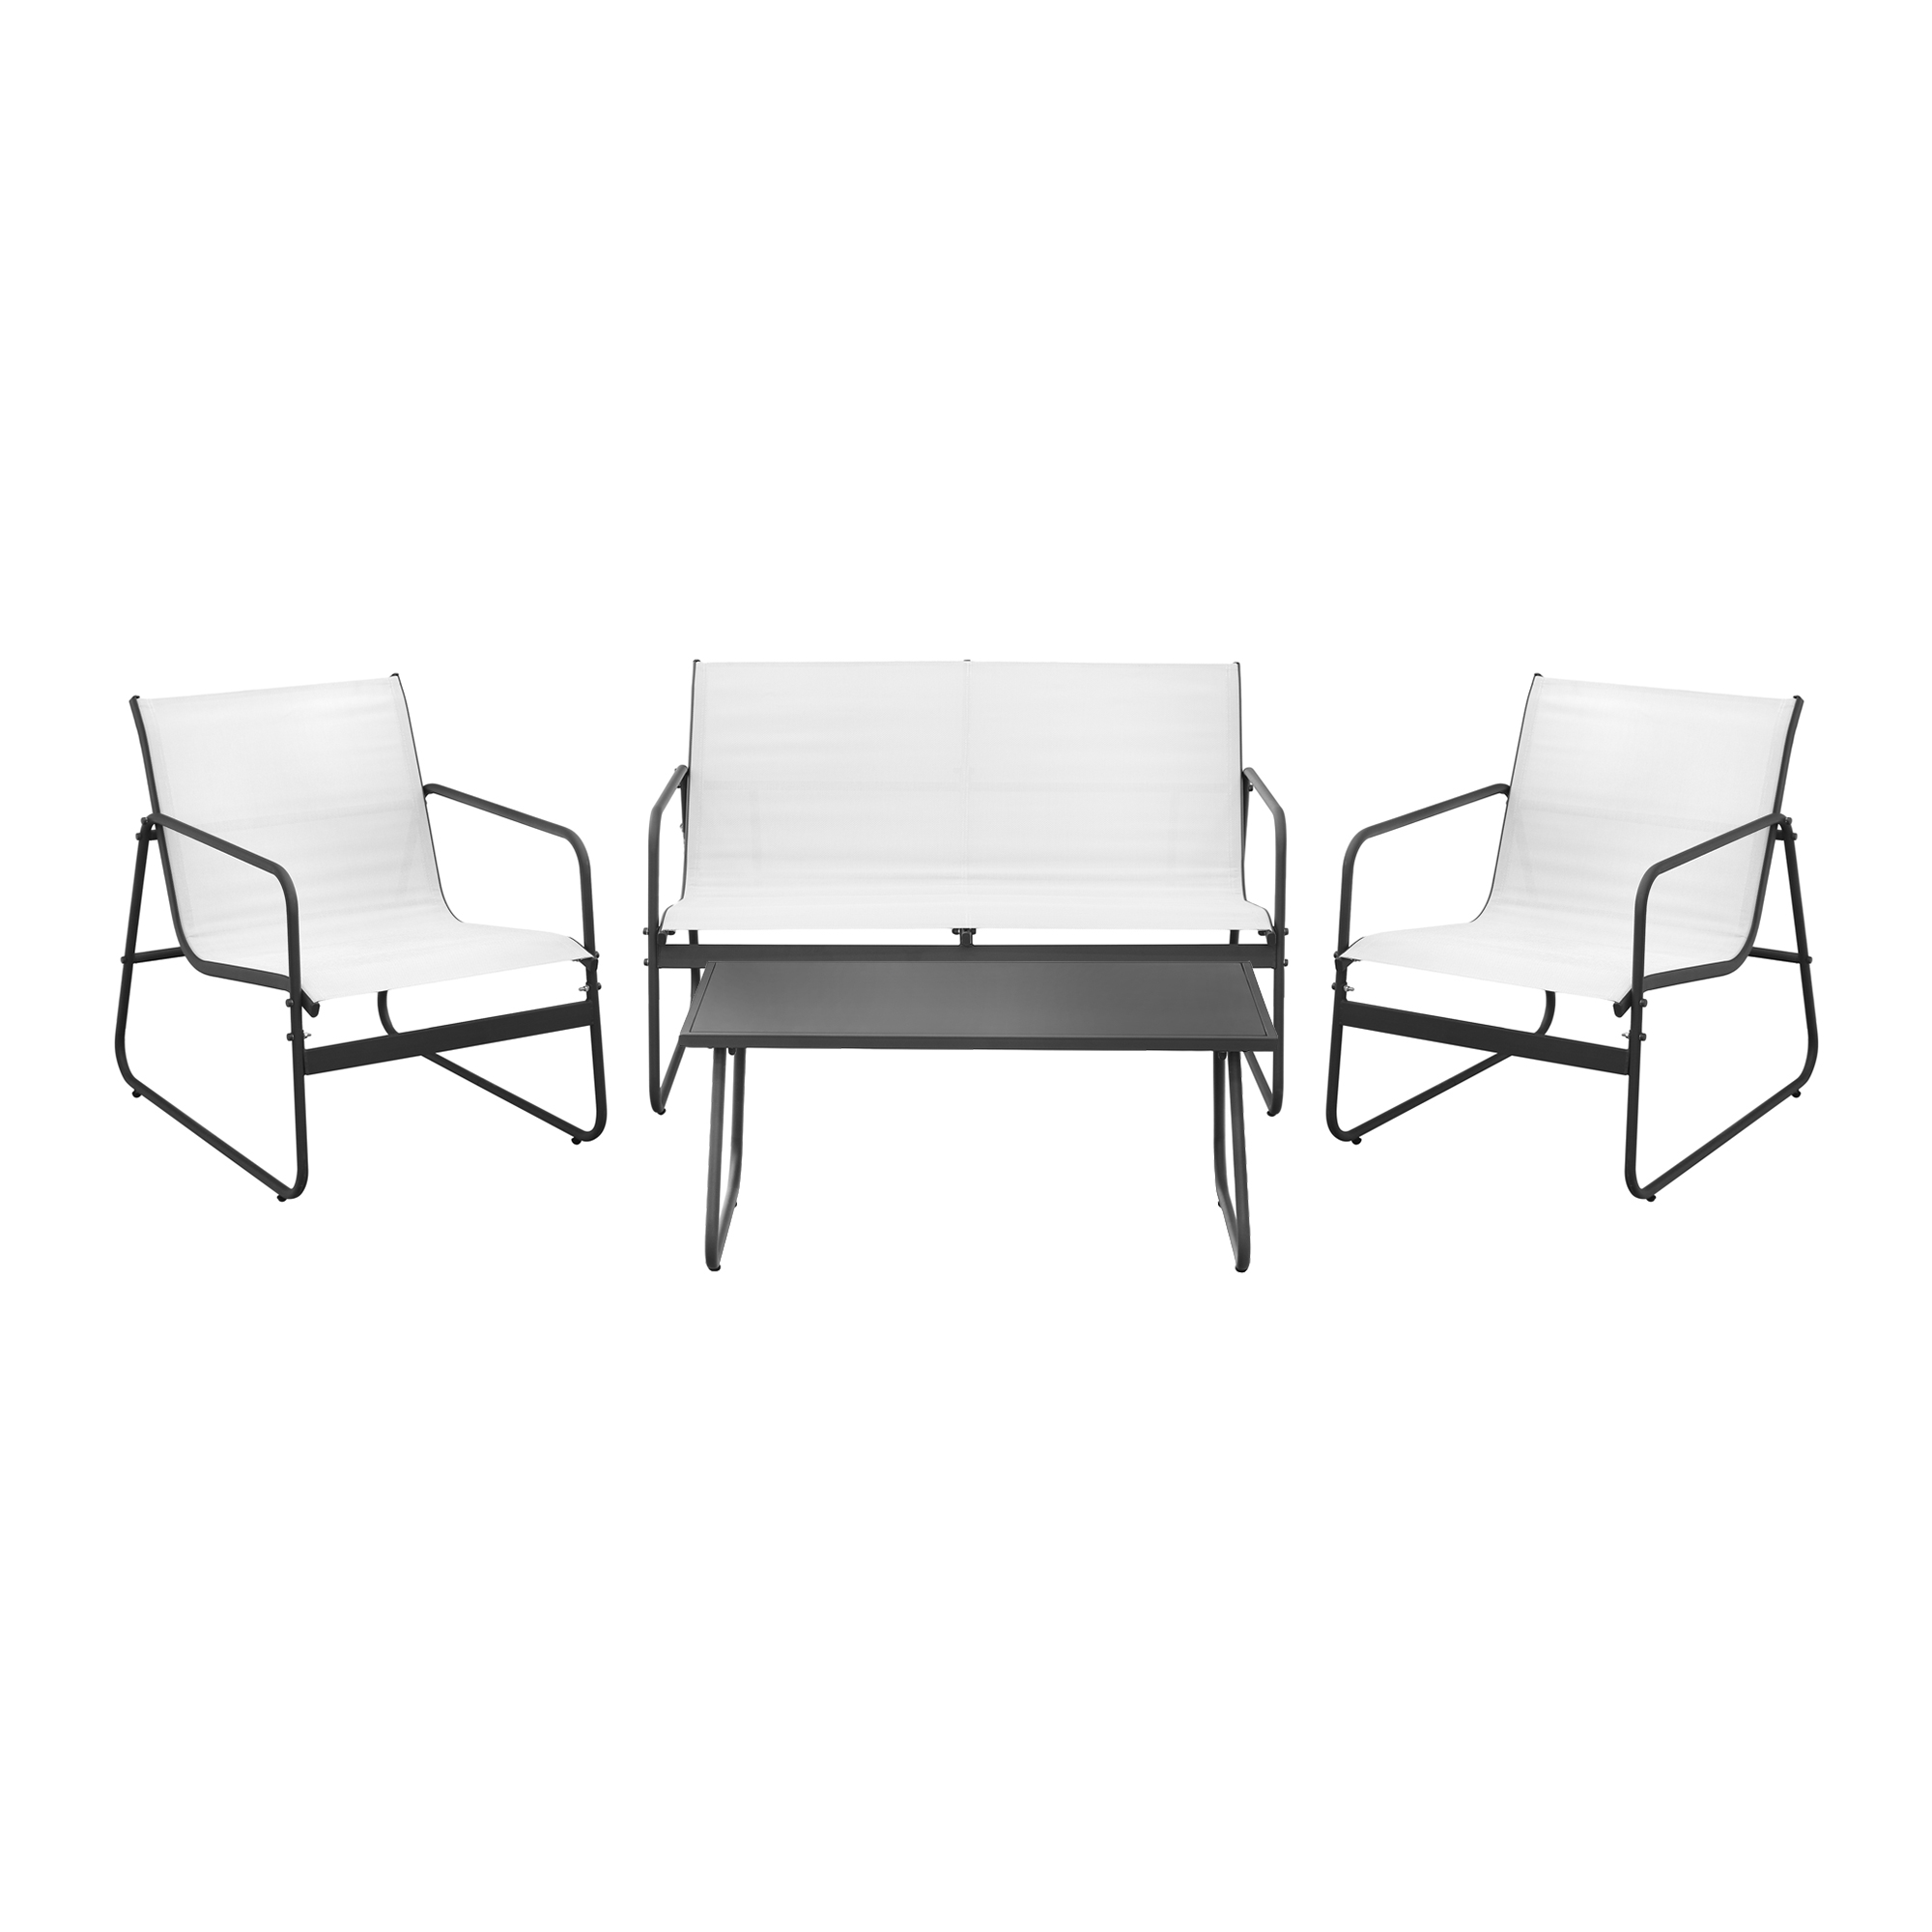 Набор садовой мебели из 4-х предметов Koopman furniture комплект мебели h l furniture hlit085edited hliac0222